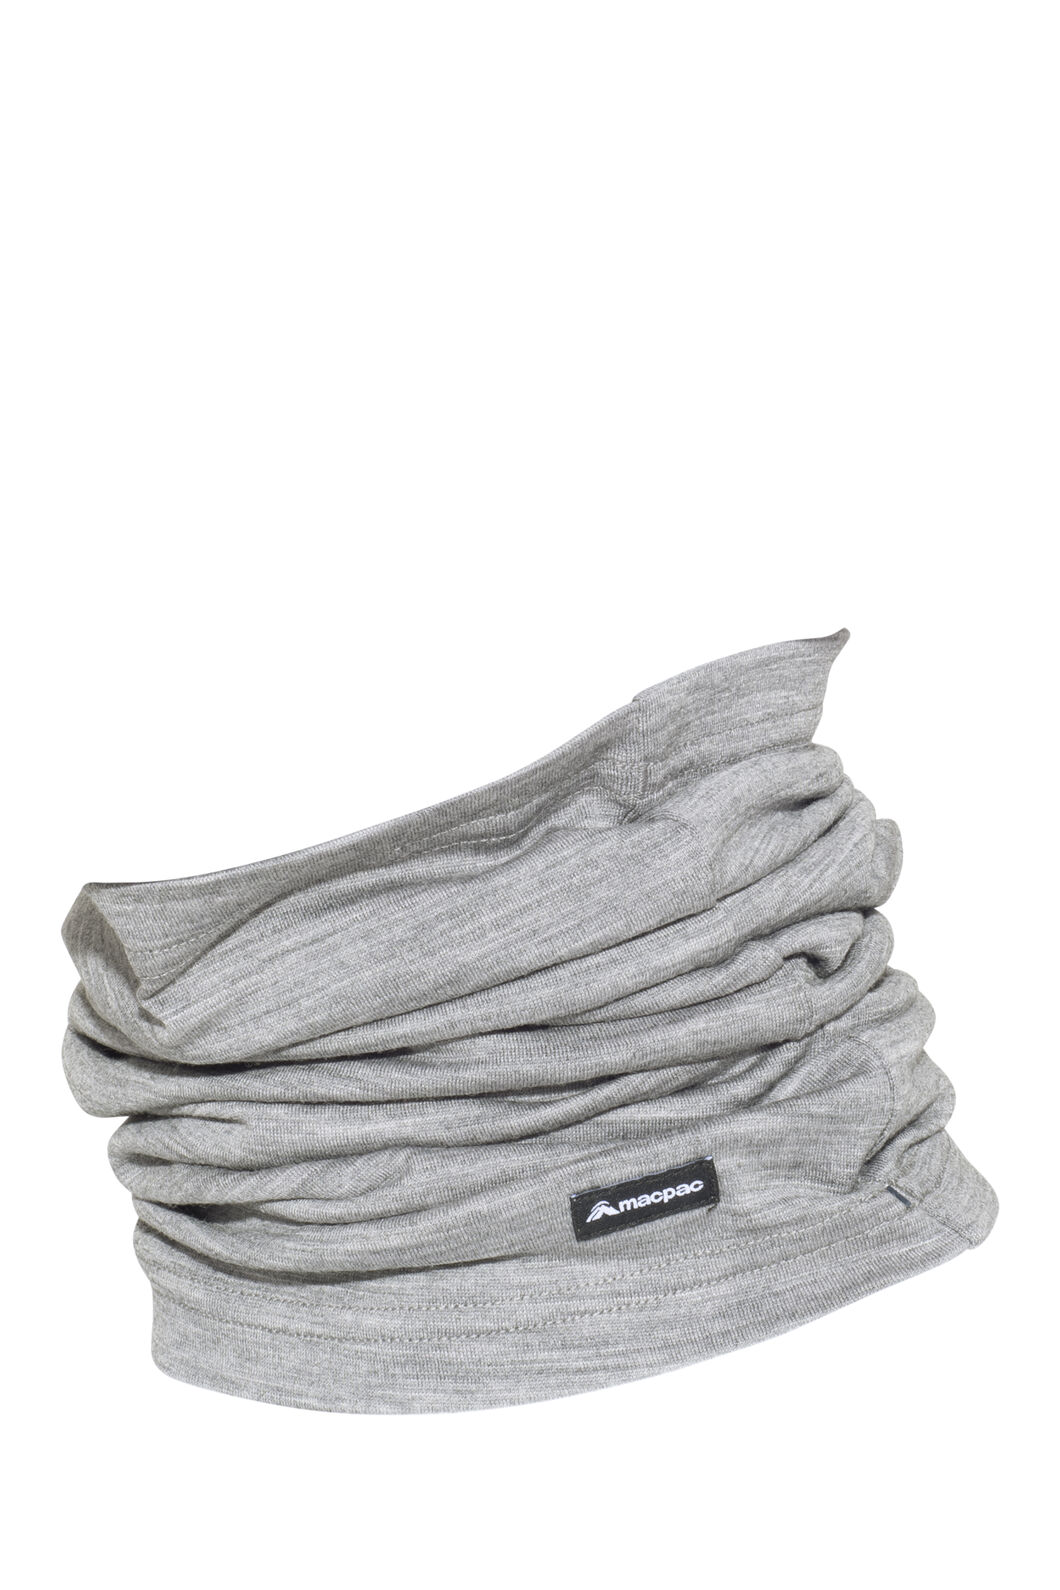 Macpac Merino 150 Neck Gaiter, Grey Marle, hi-res